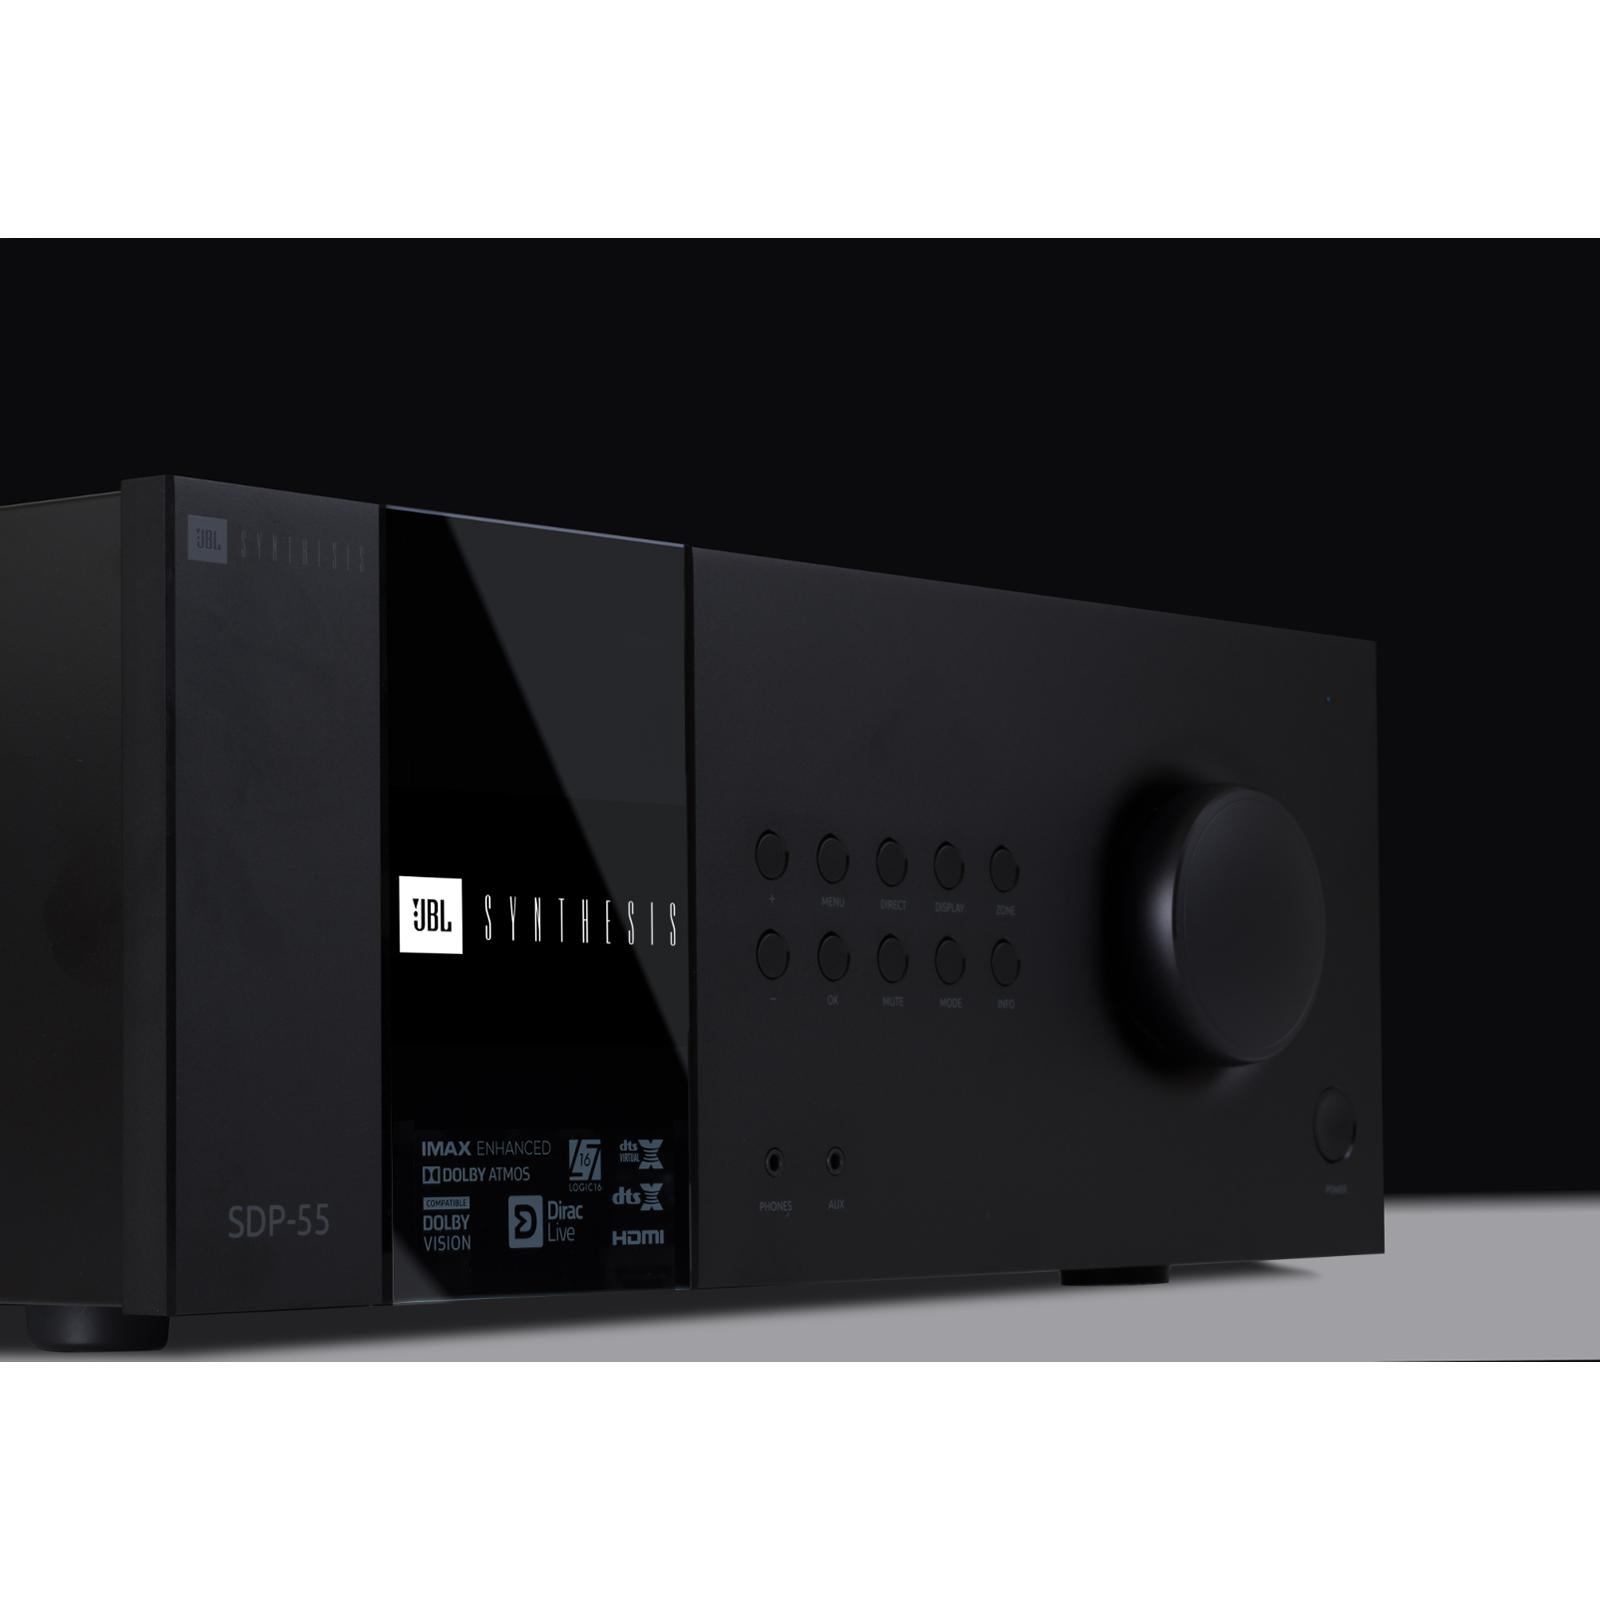 SDP-55 - Black - 16 Ch. Immersive Surround Sound Processor with Dante - Detailshot 2